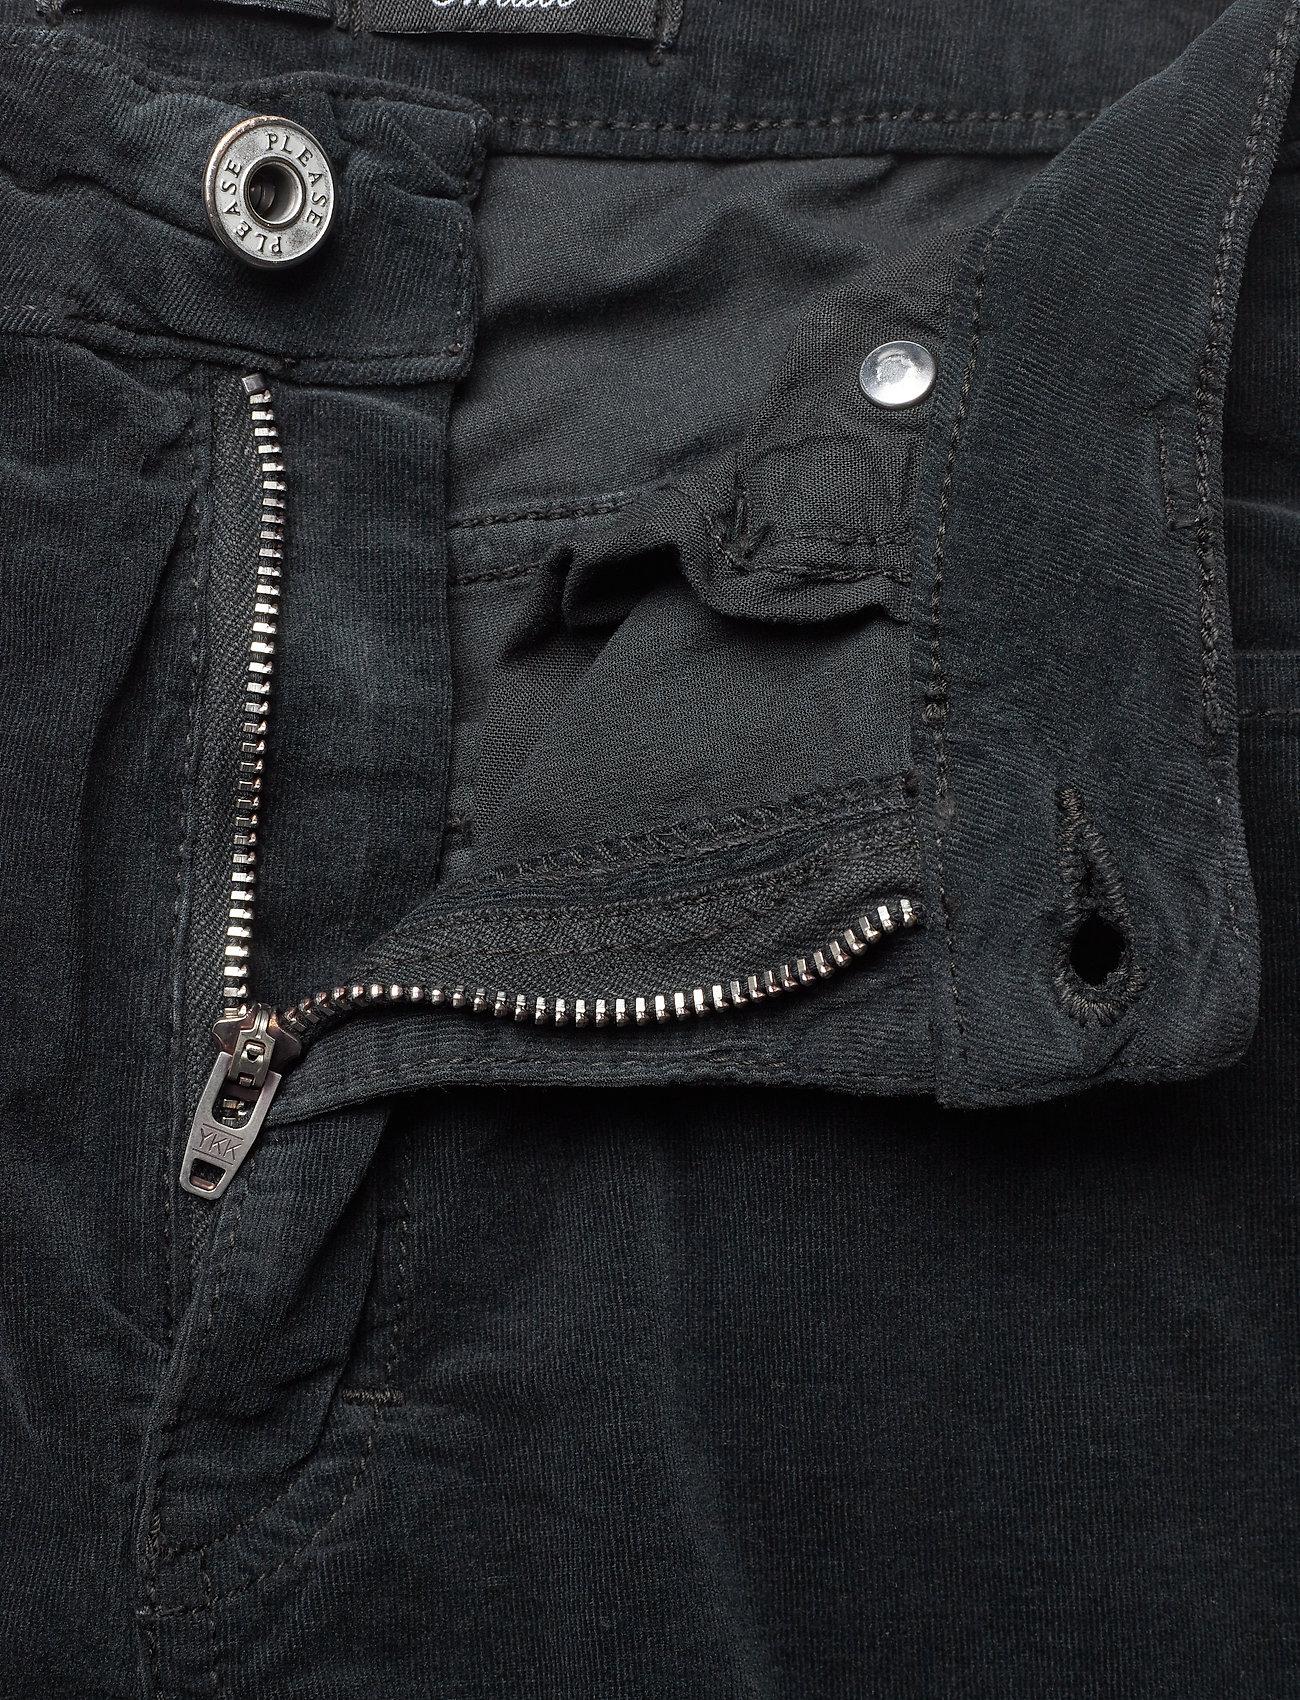 Please Jeans Longcut Baby Cod Cut (Grafitte), 659.40